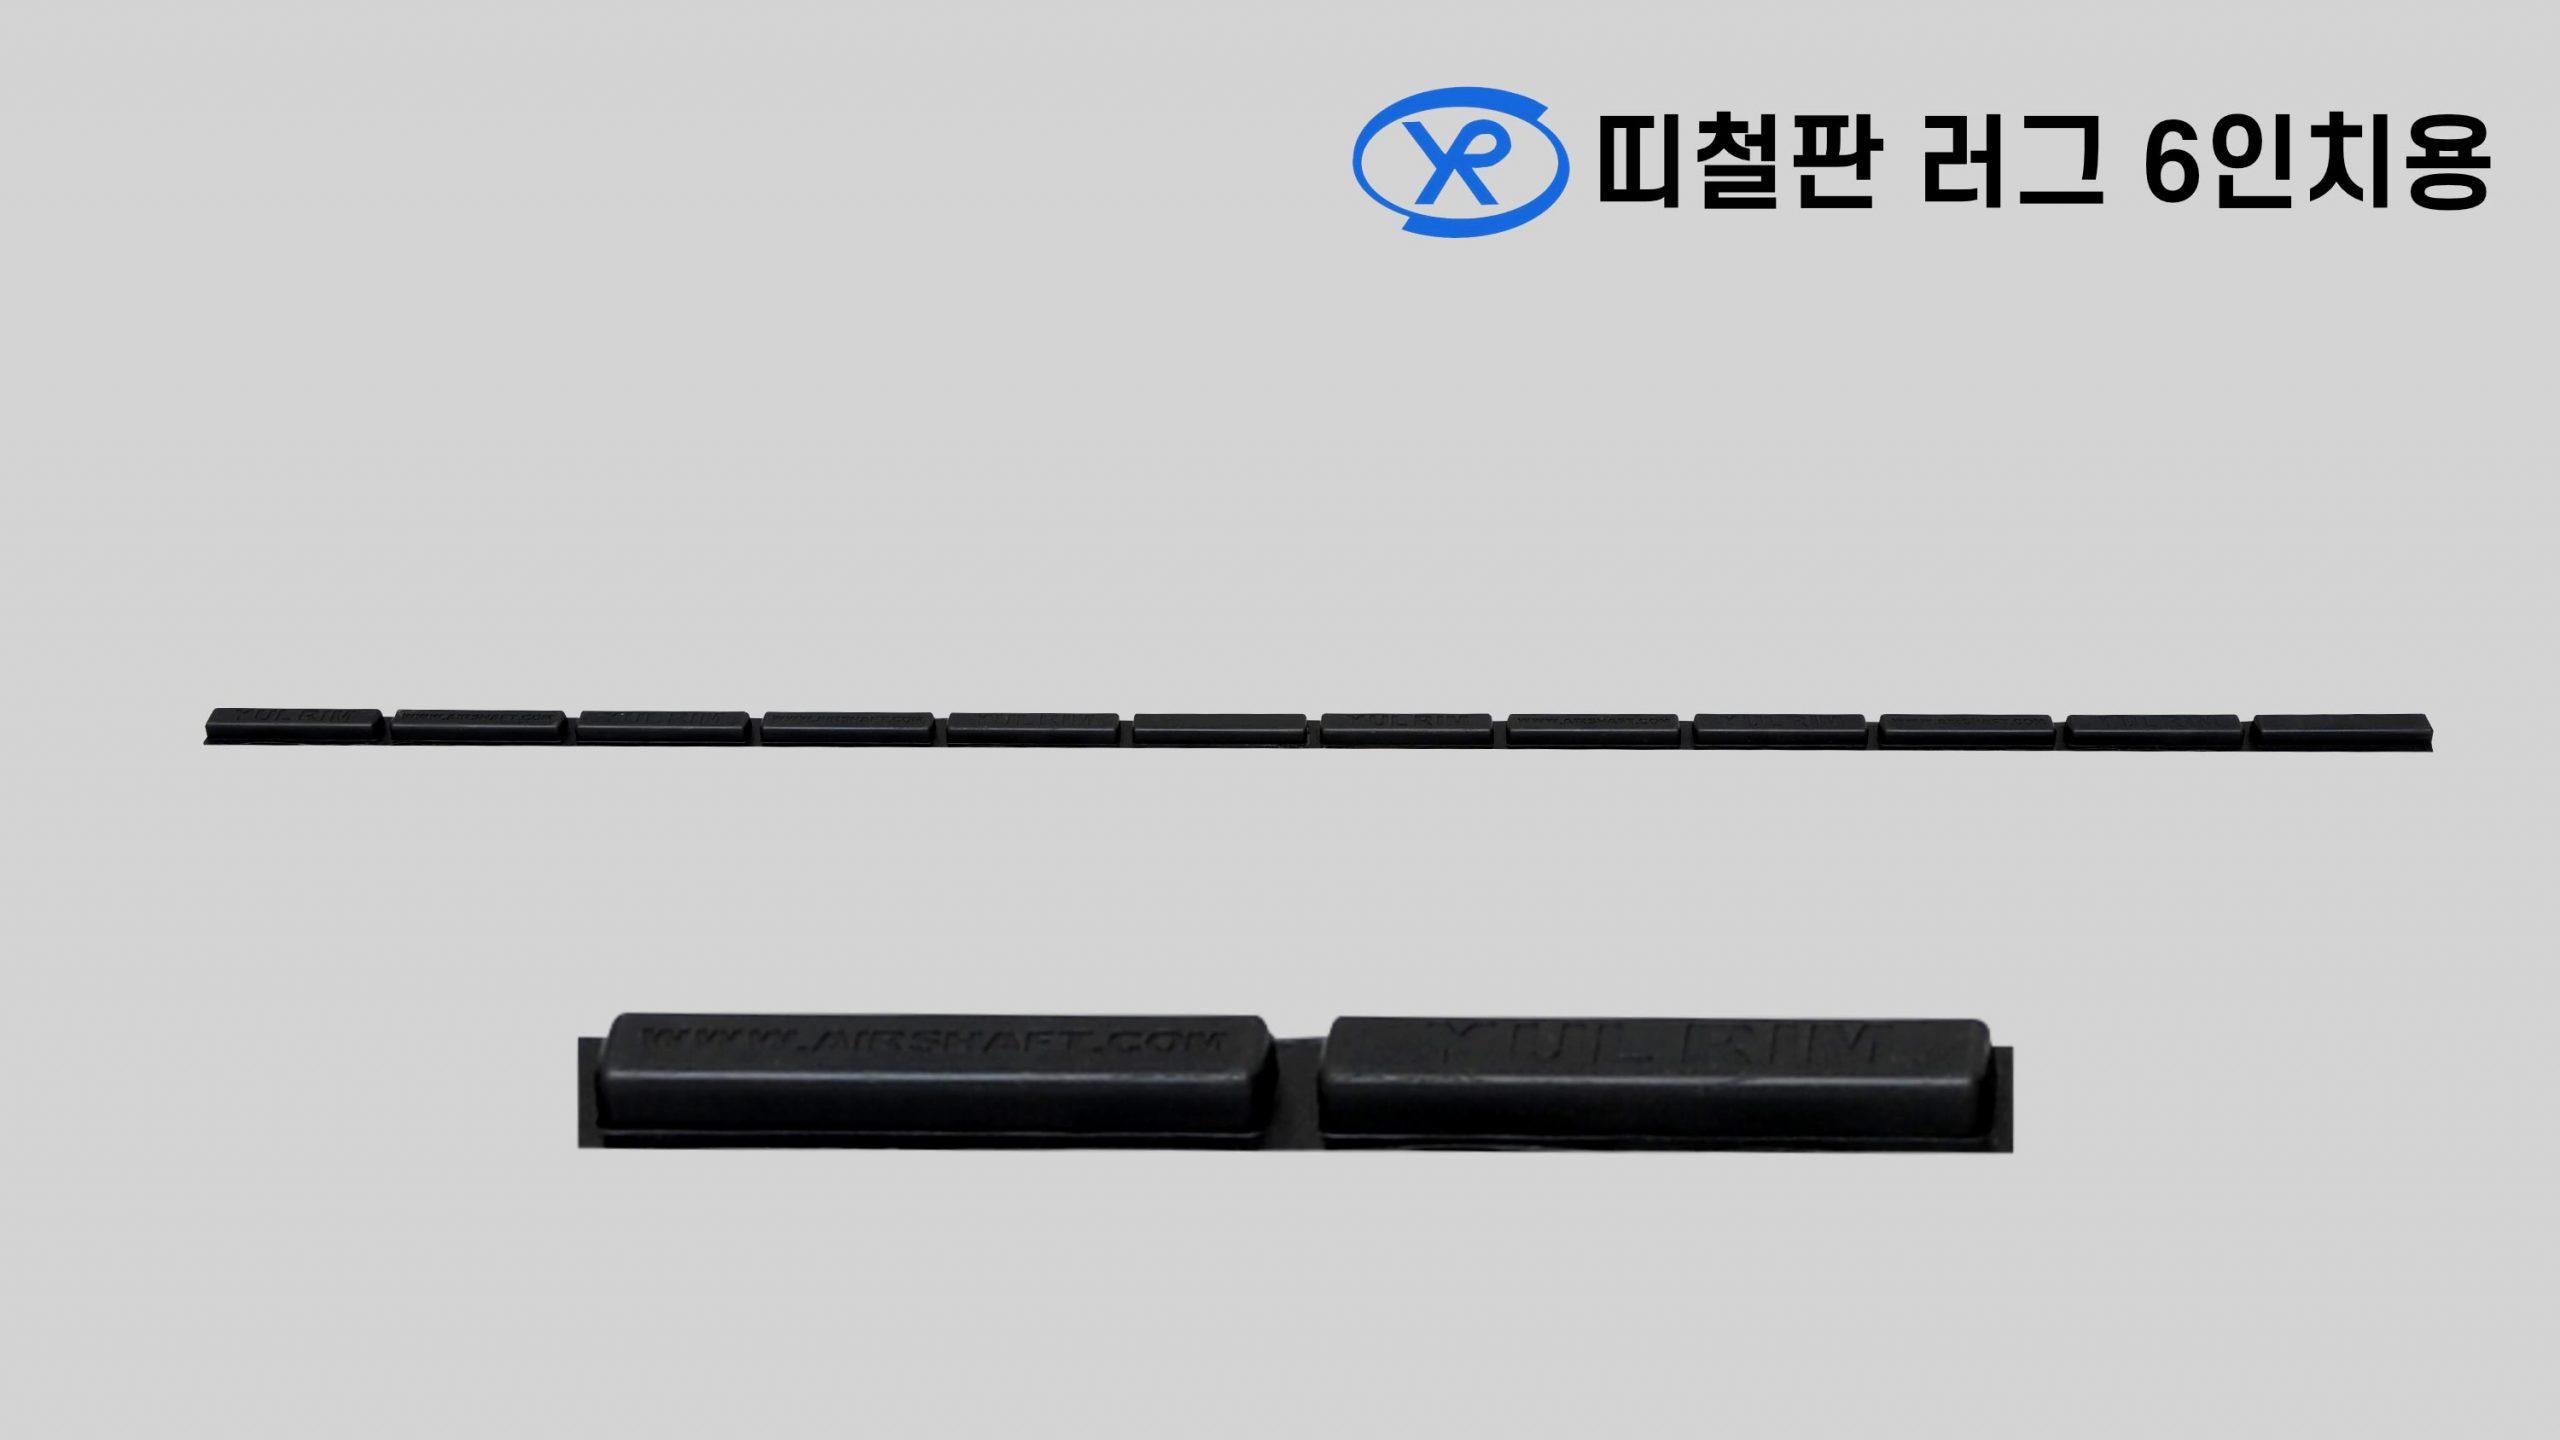 Iron-Plate-Lugs-6-kr